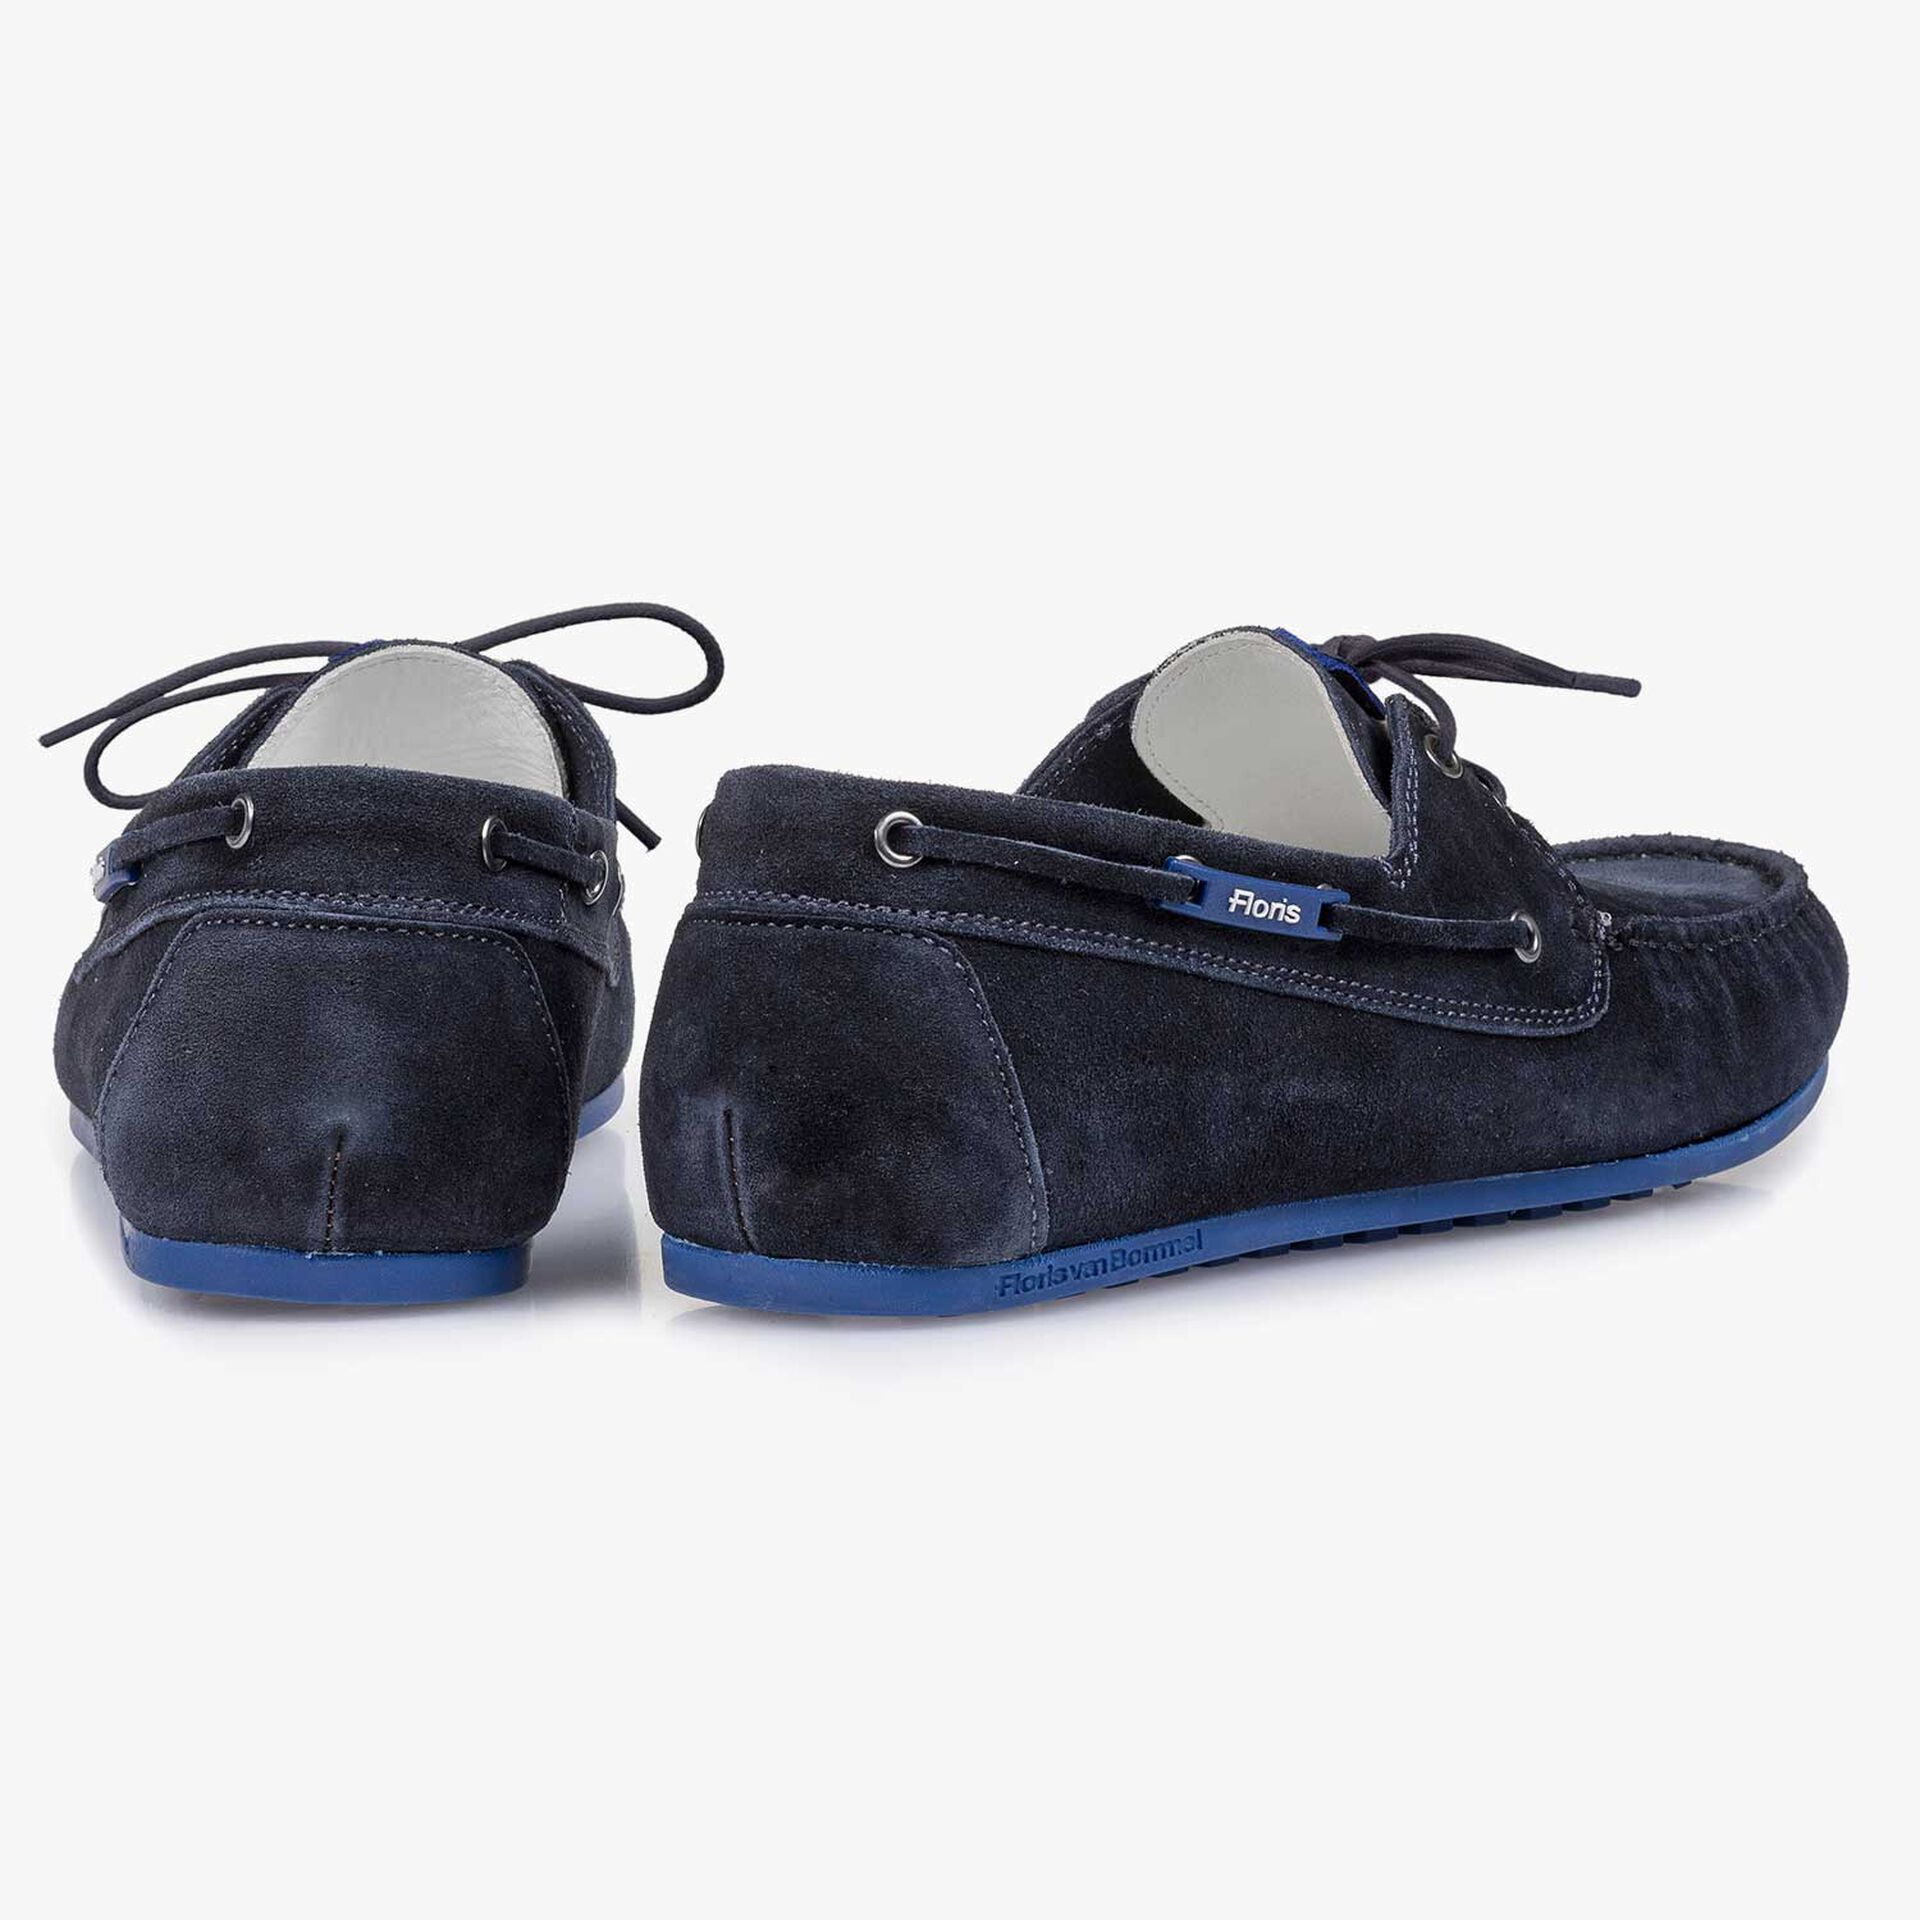 Blue slightly buffed suede leather sailing shoe